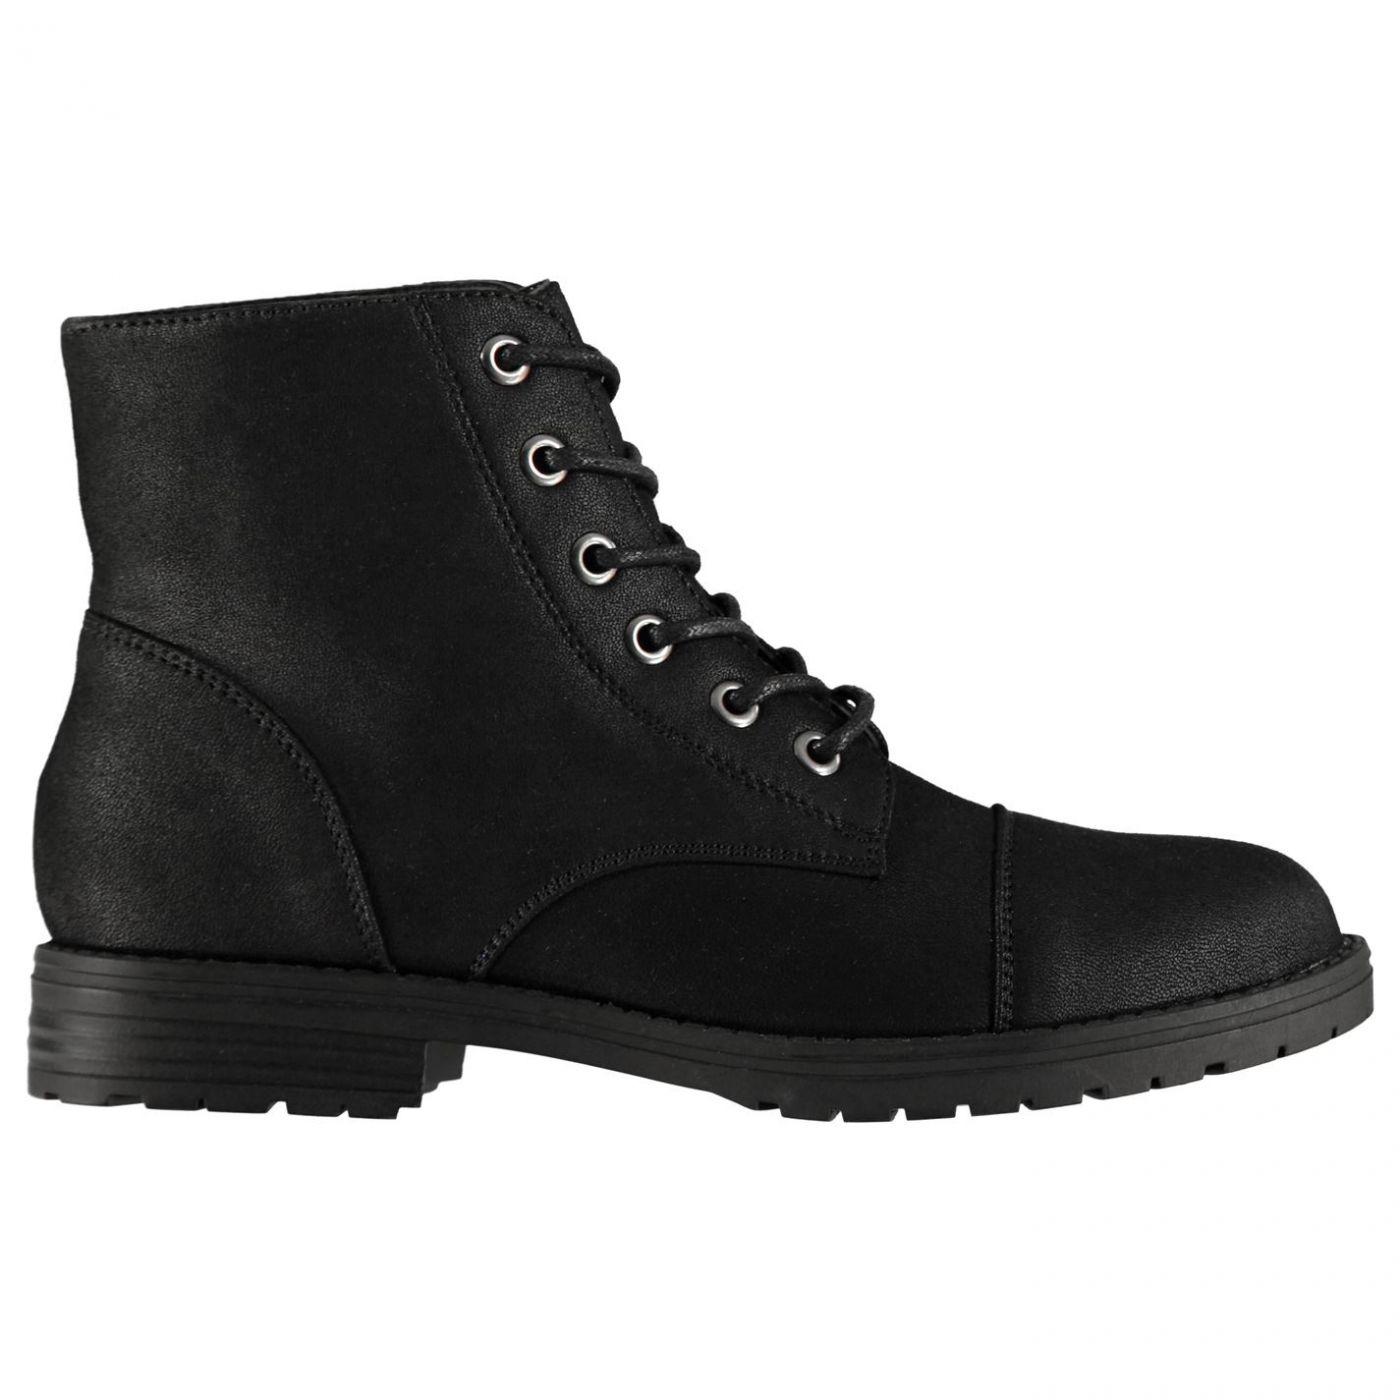 Miso Myla Military Junior Girls Boots